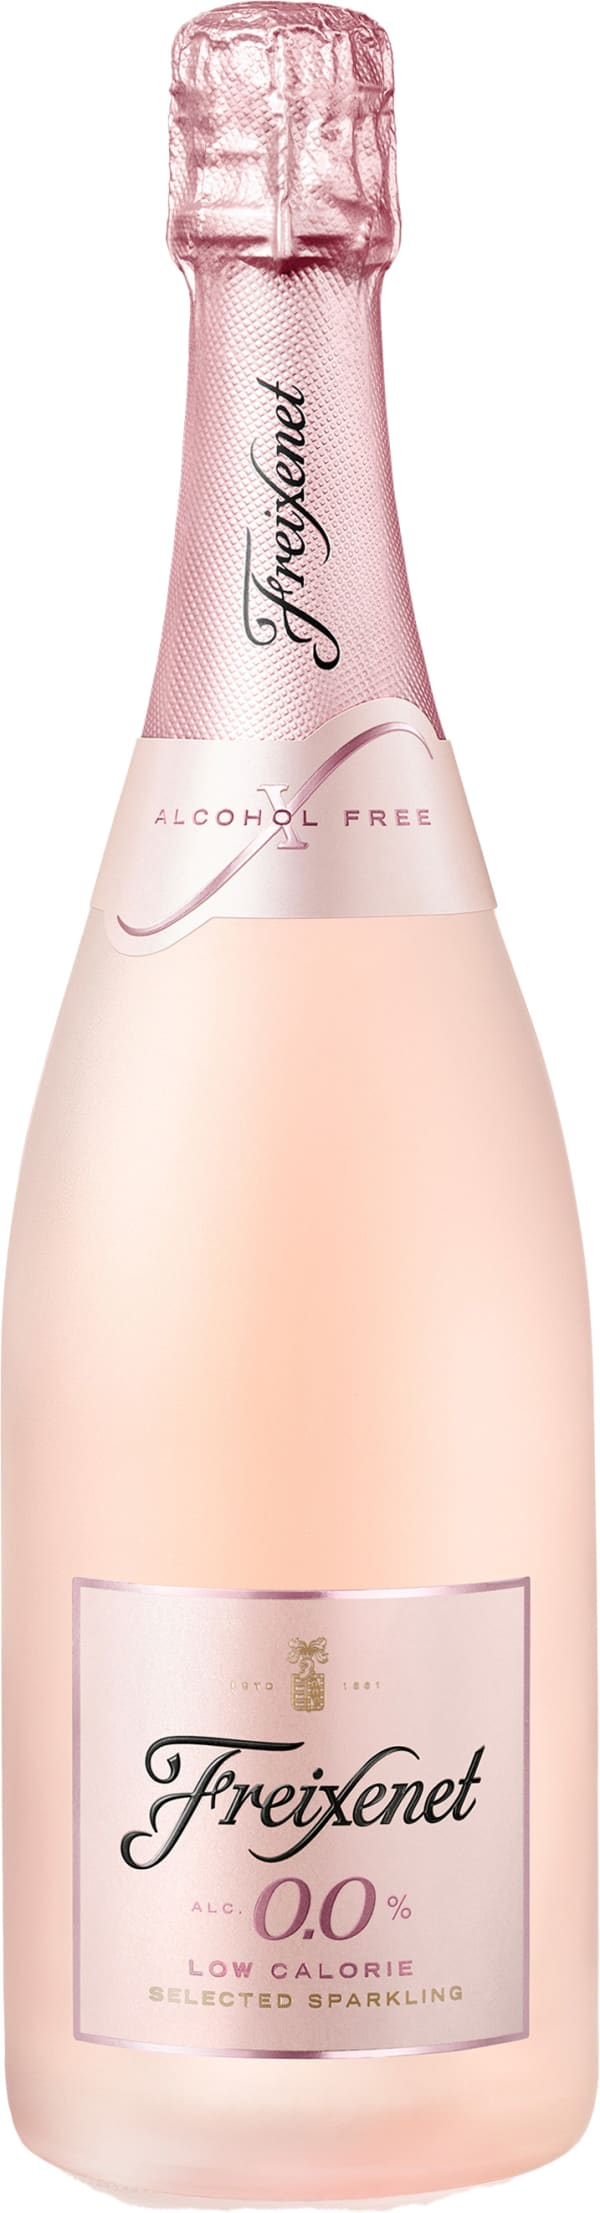 Freixenet Rosado Alcohol Free Sparkling